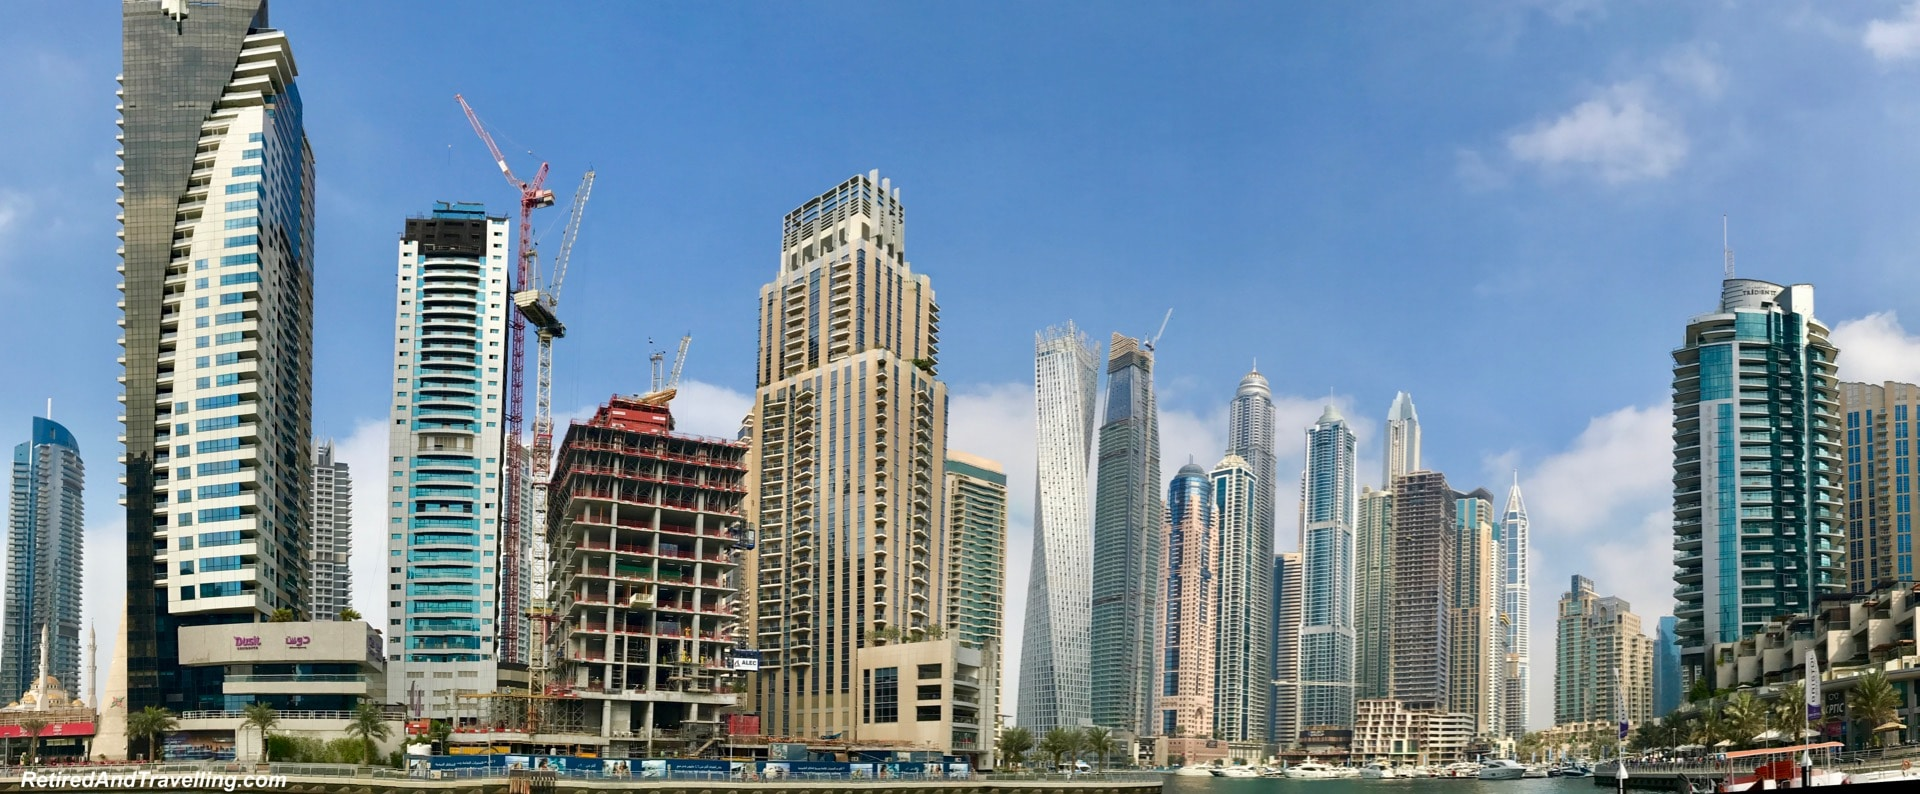 Dubai Marina - Buidings and Architecture - Things To Do In Dubai.jpg